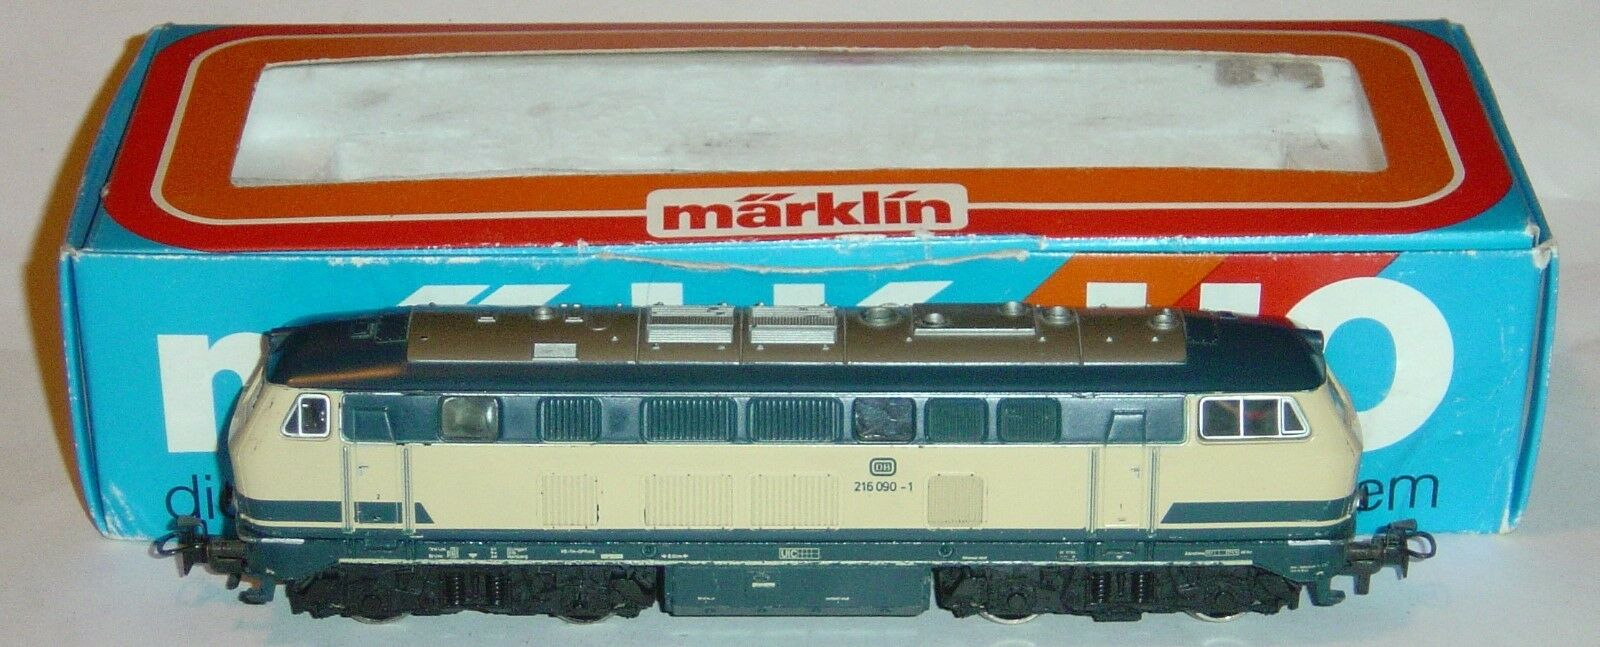 MARKLIN HO, LOCOMOTORA ANALÓGICA BR 216 090-1 DB REF.3074, DIGITAL OPCIONAL